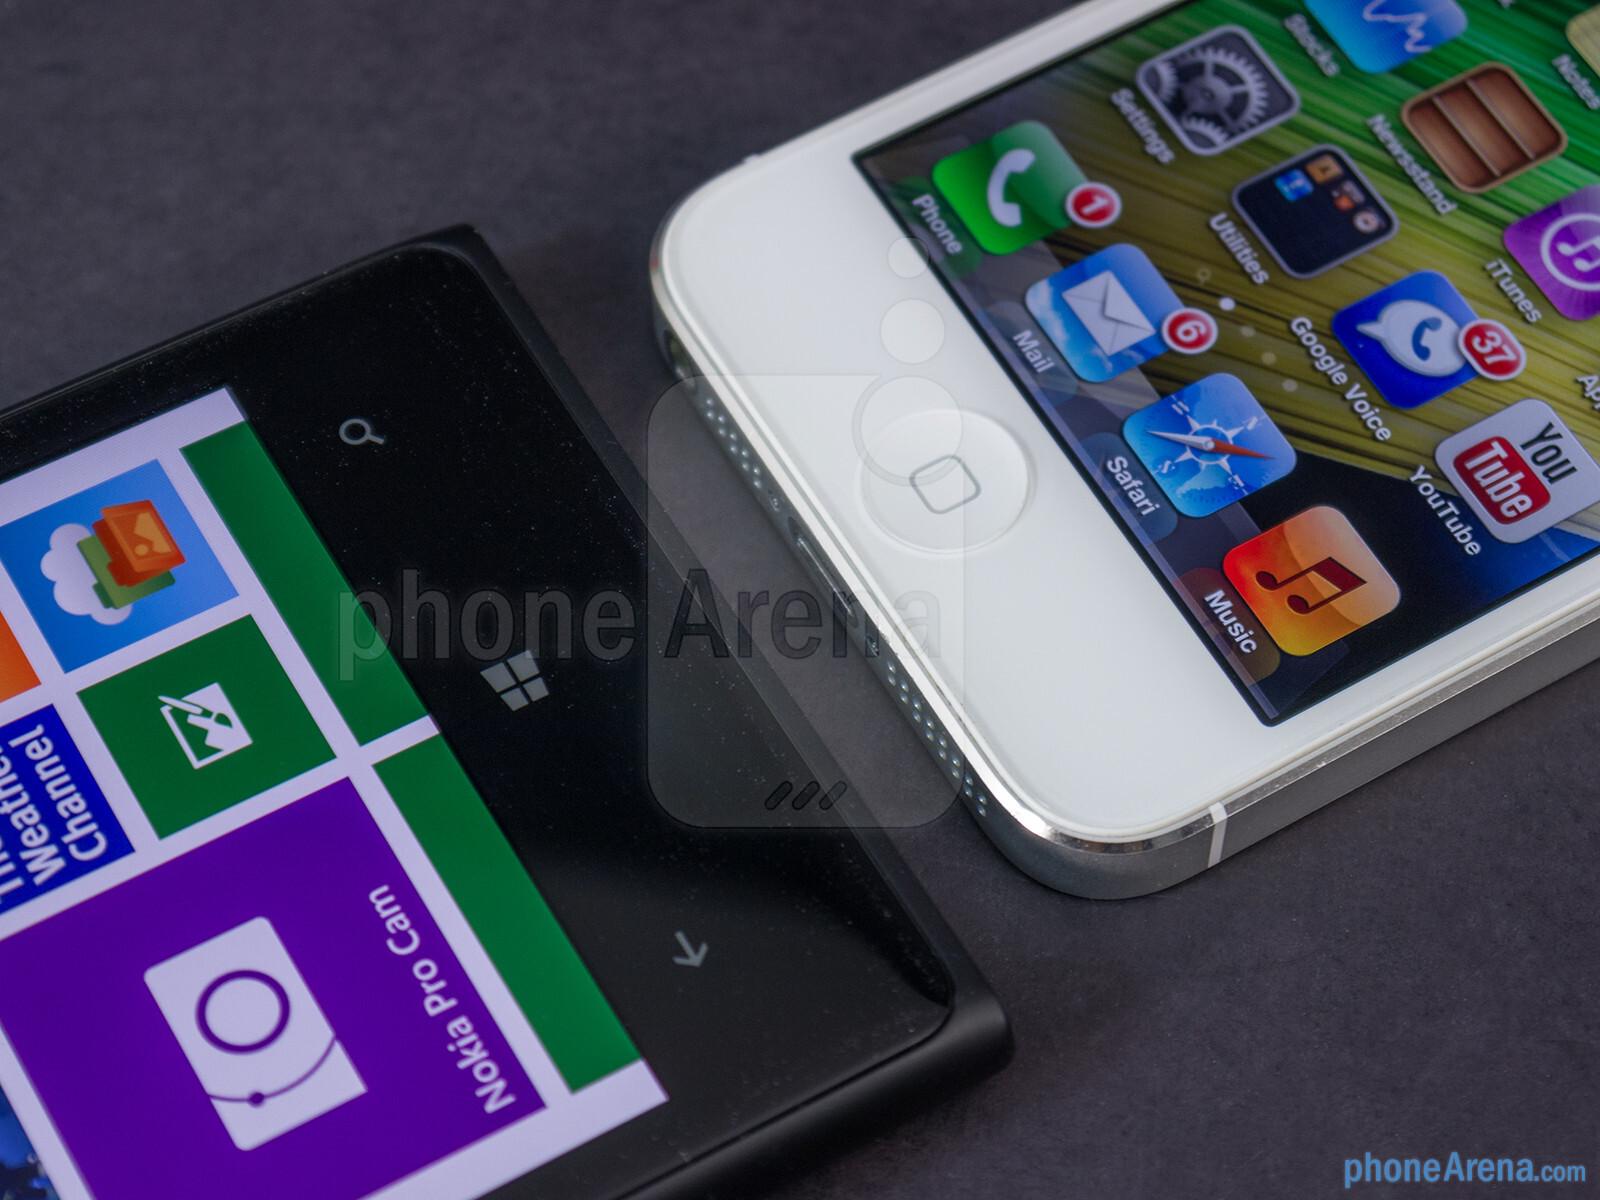 nokia lumia 1020 vs iphone 5s. 1 2 nokia lumia 1020 vs iphone 5s a